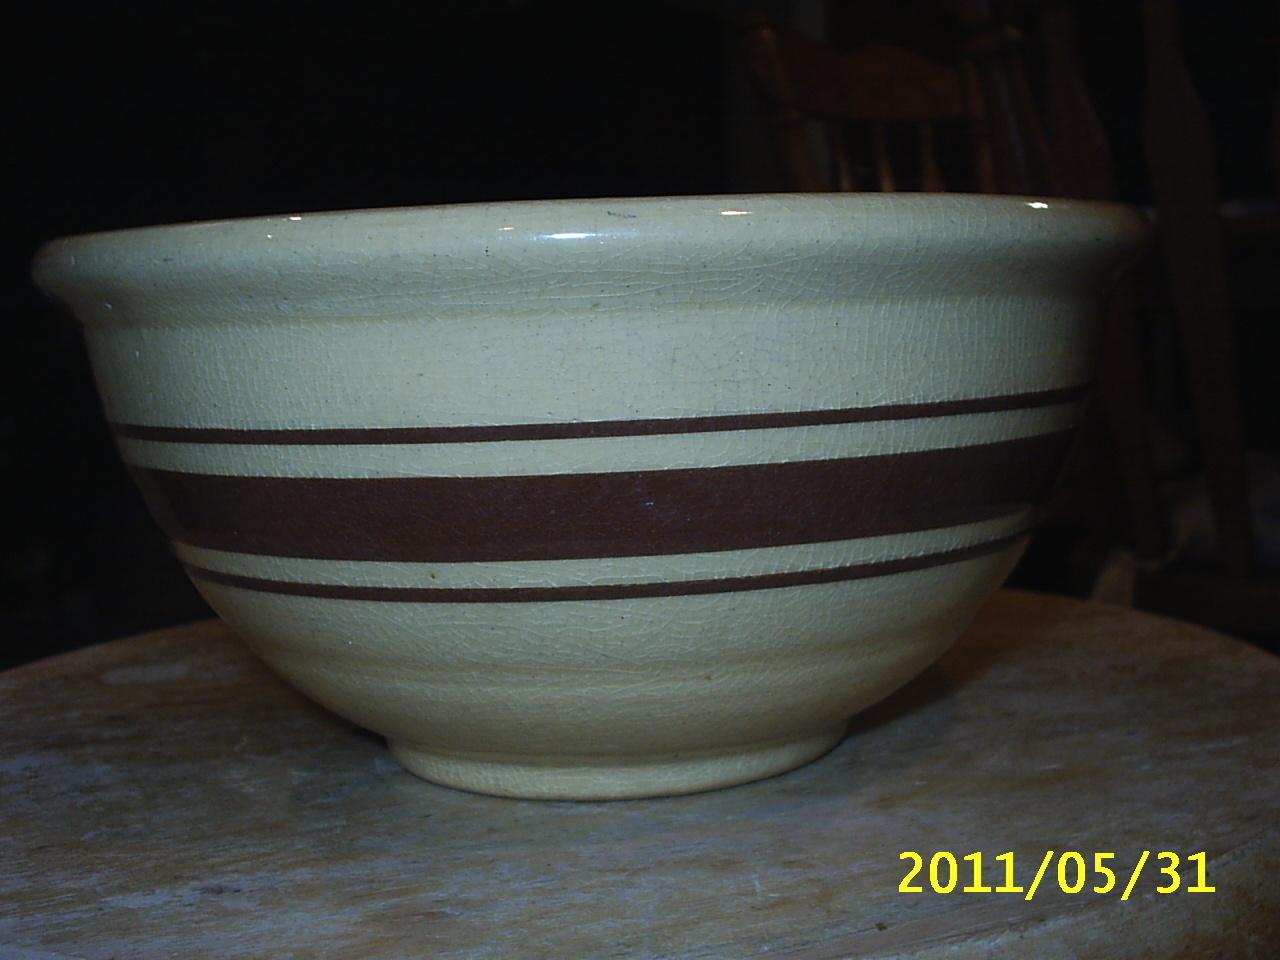 Vintage Yellow Ware? Small Mixing Bowl and similar items